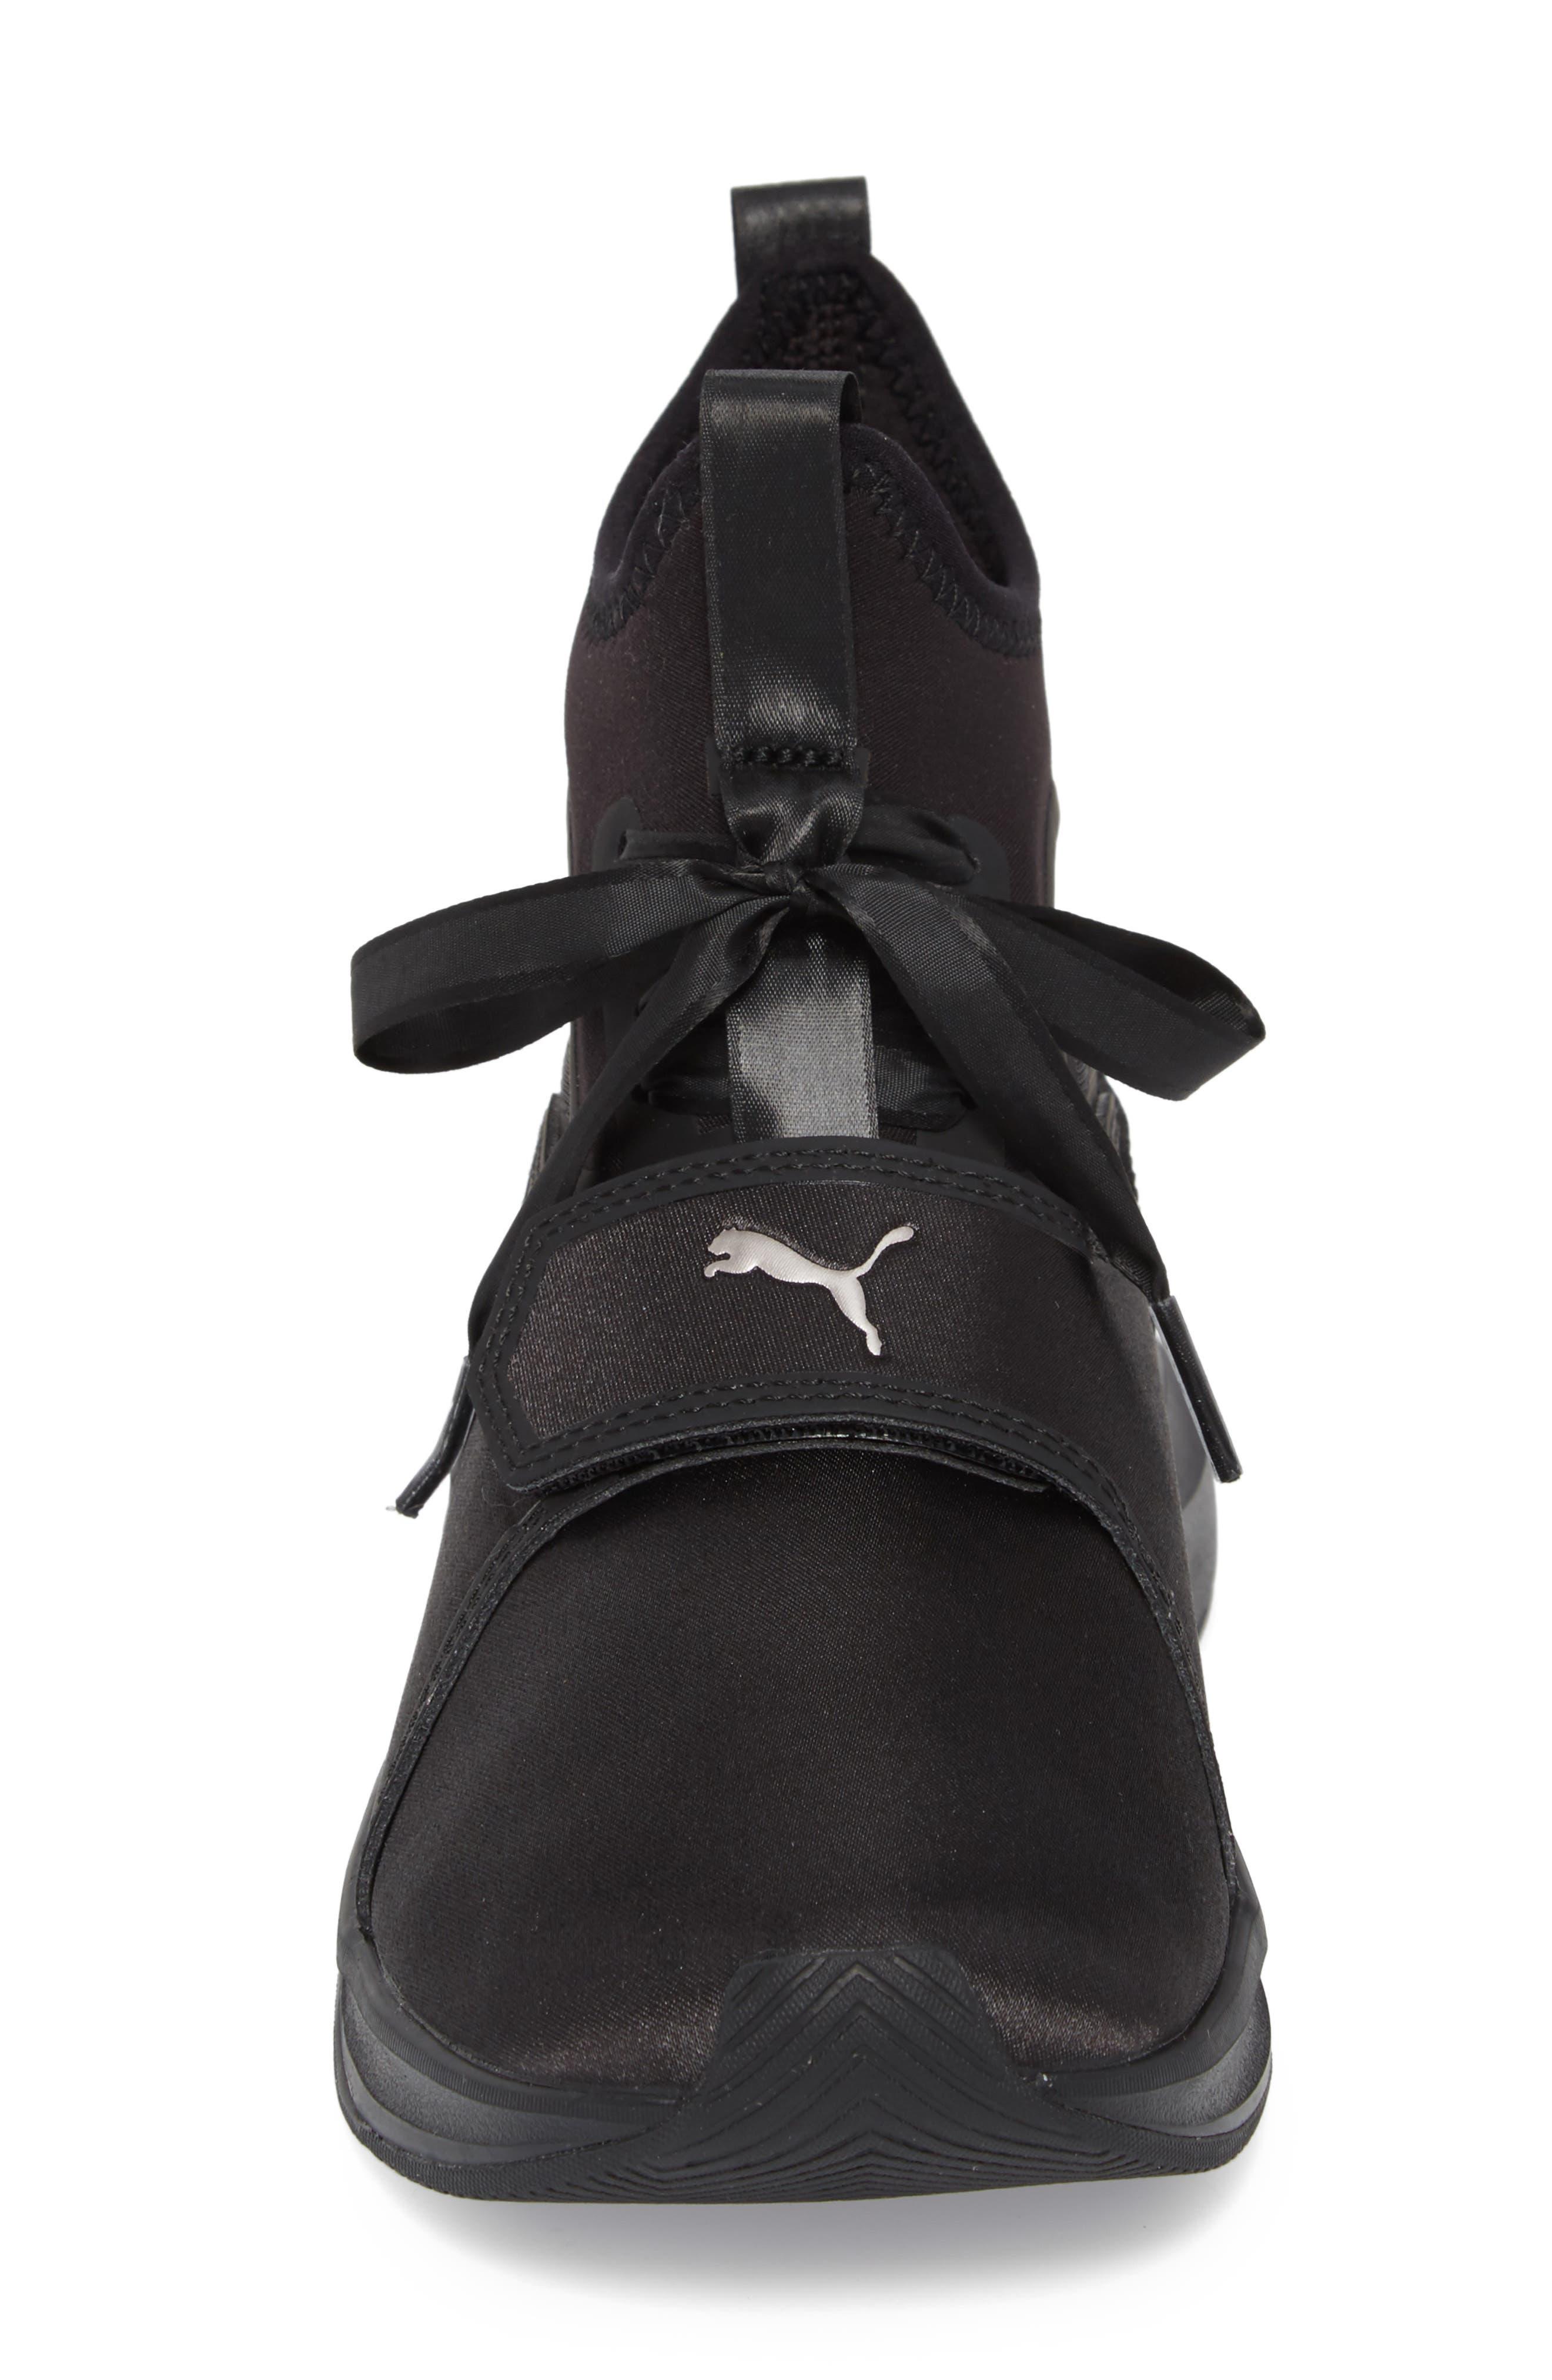 Phenom Satin EP High Top Training Shoe,                             Alternate thumbnail 4, color,                             Puma Black/ Puma Black